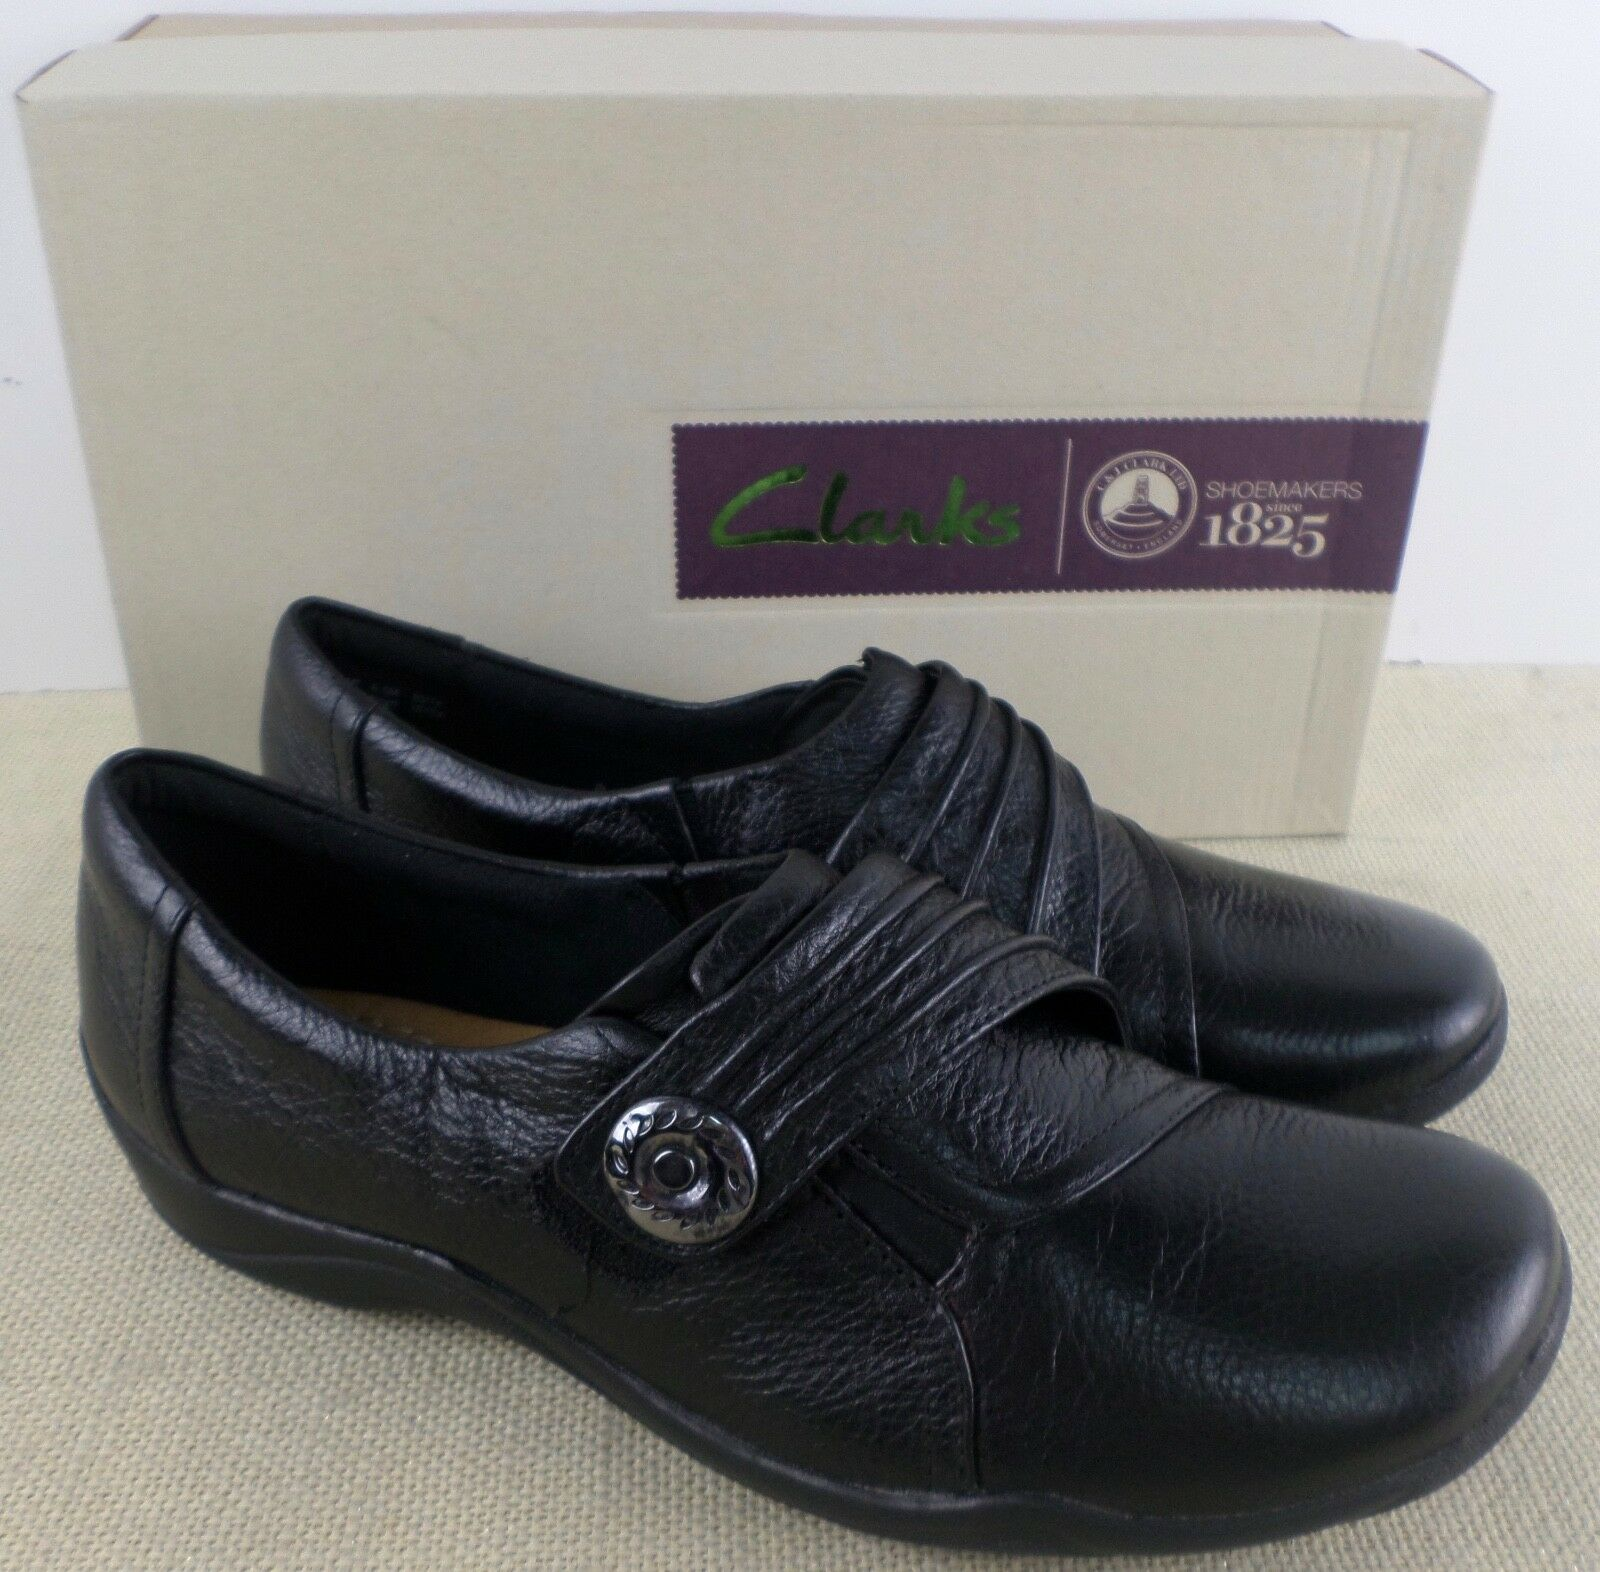 CLARKS 02319 KESSA ALCOVE ON WOMEN'S BLACK LEATHER SLIP ON ALCOVE Schuhe NEW IN BOX 6faedd